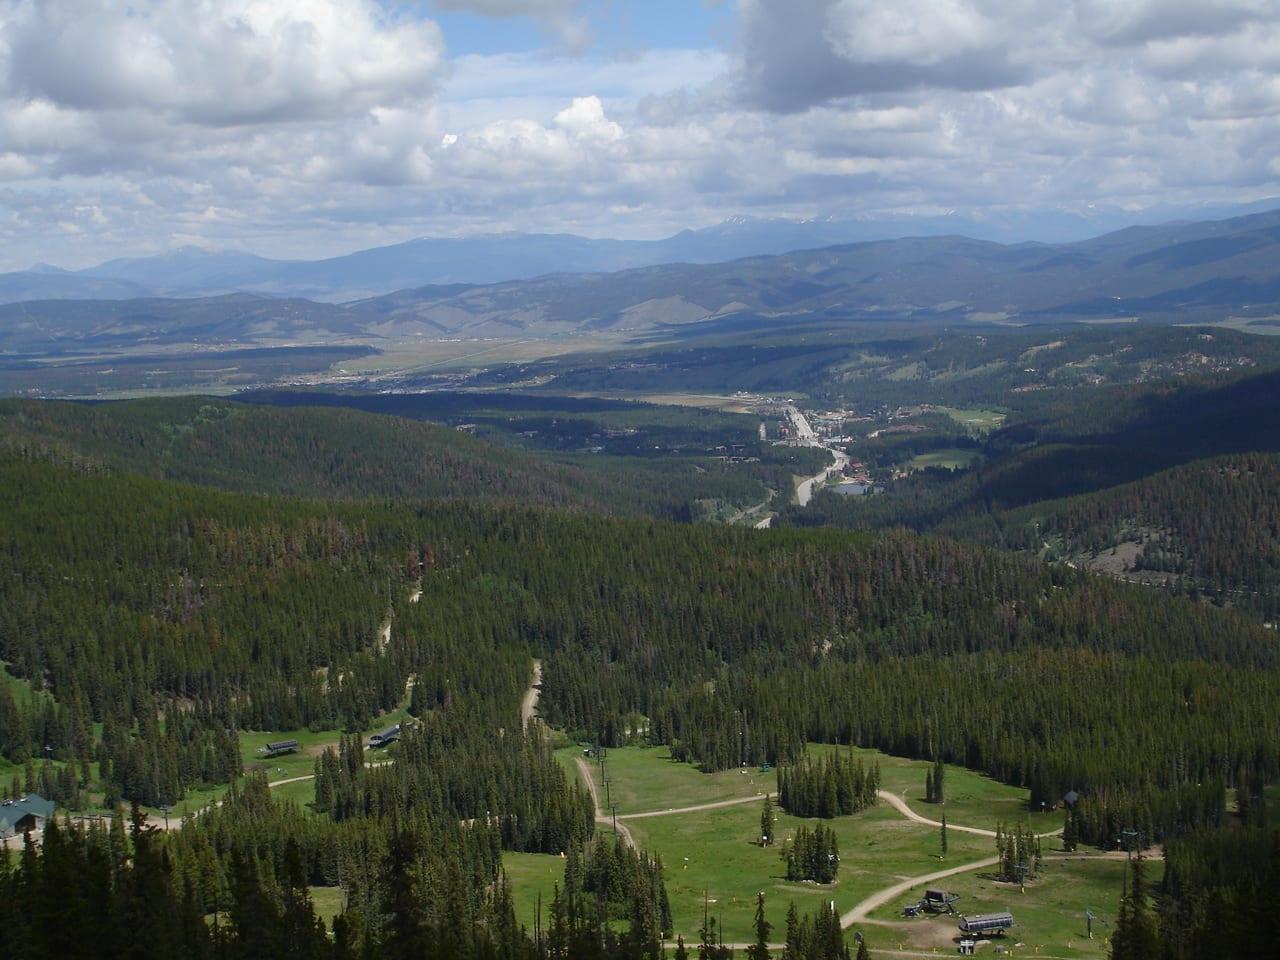 Winter Park Colorado Aerial View